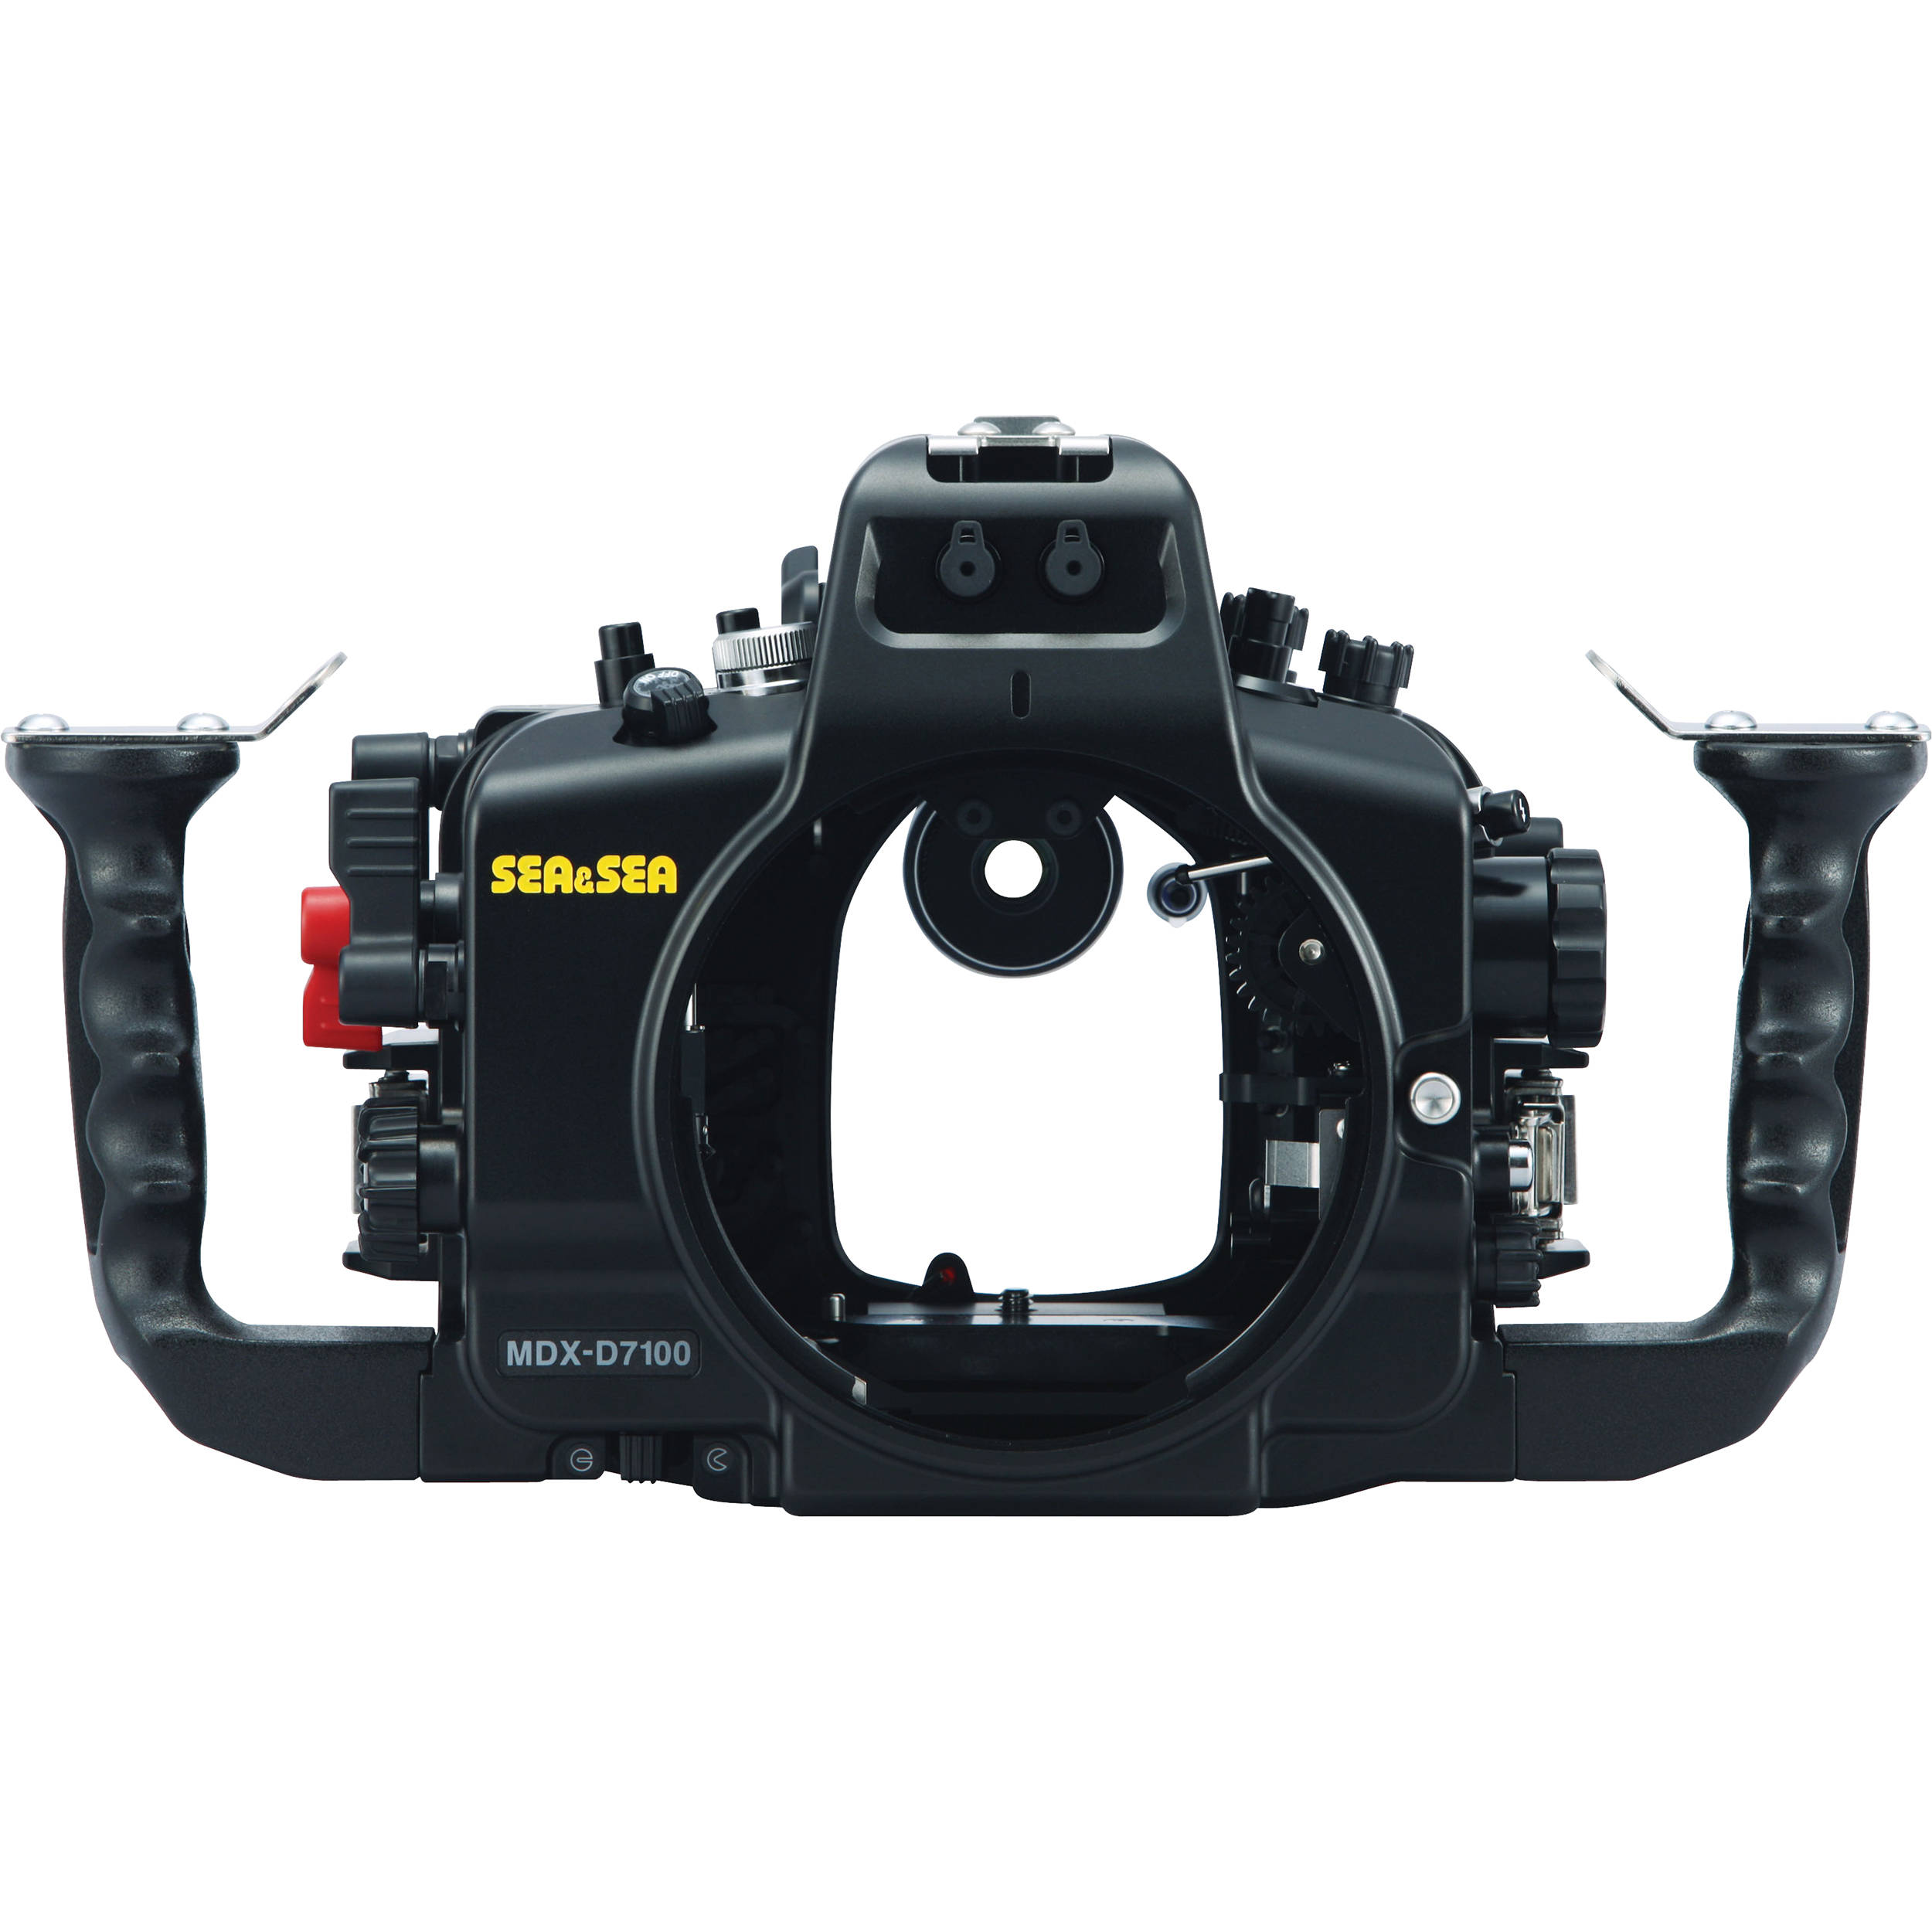 Camera Dslr Underwater Camera sea mdx d7100 underwater housing for nikon ss 06167 or d7200 dslr camera